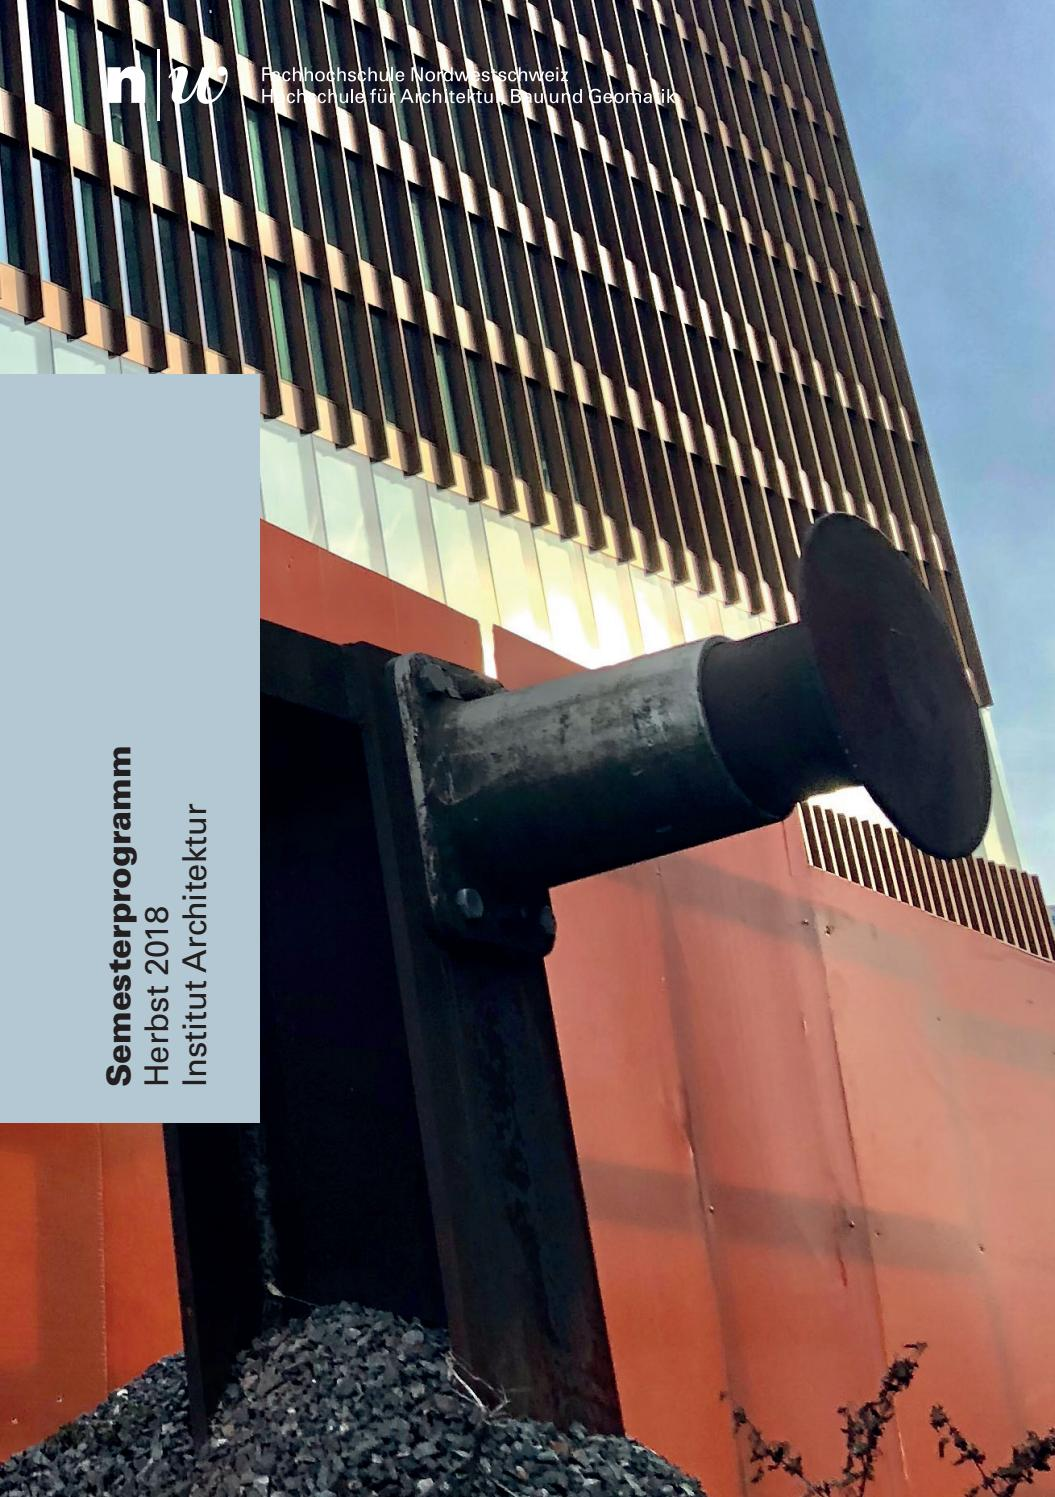 2389993ccfd5d FHNW IArch Semesterprogramm HS18 by Master Architektur - issuu